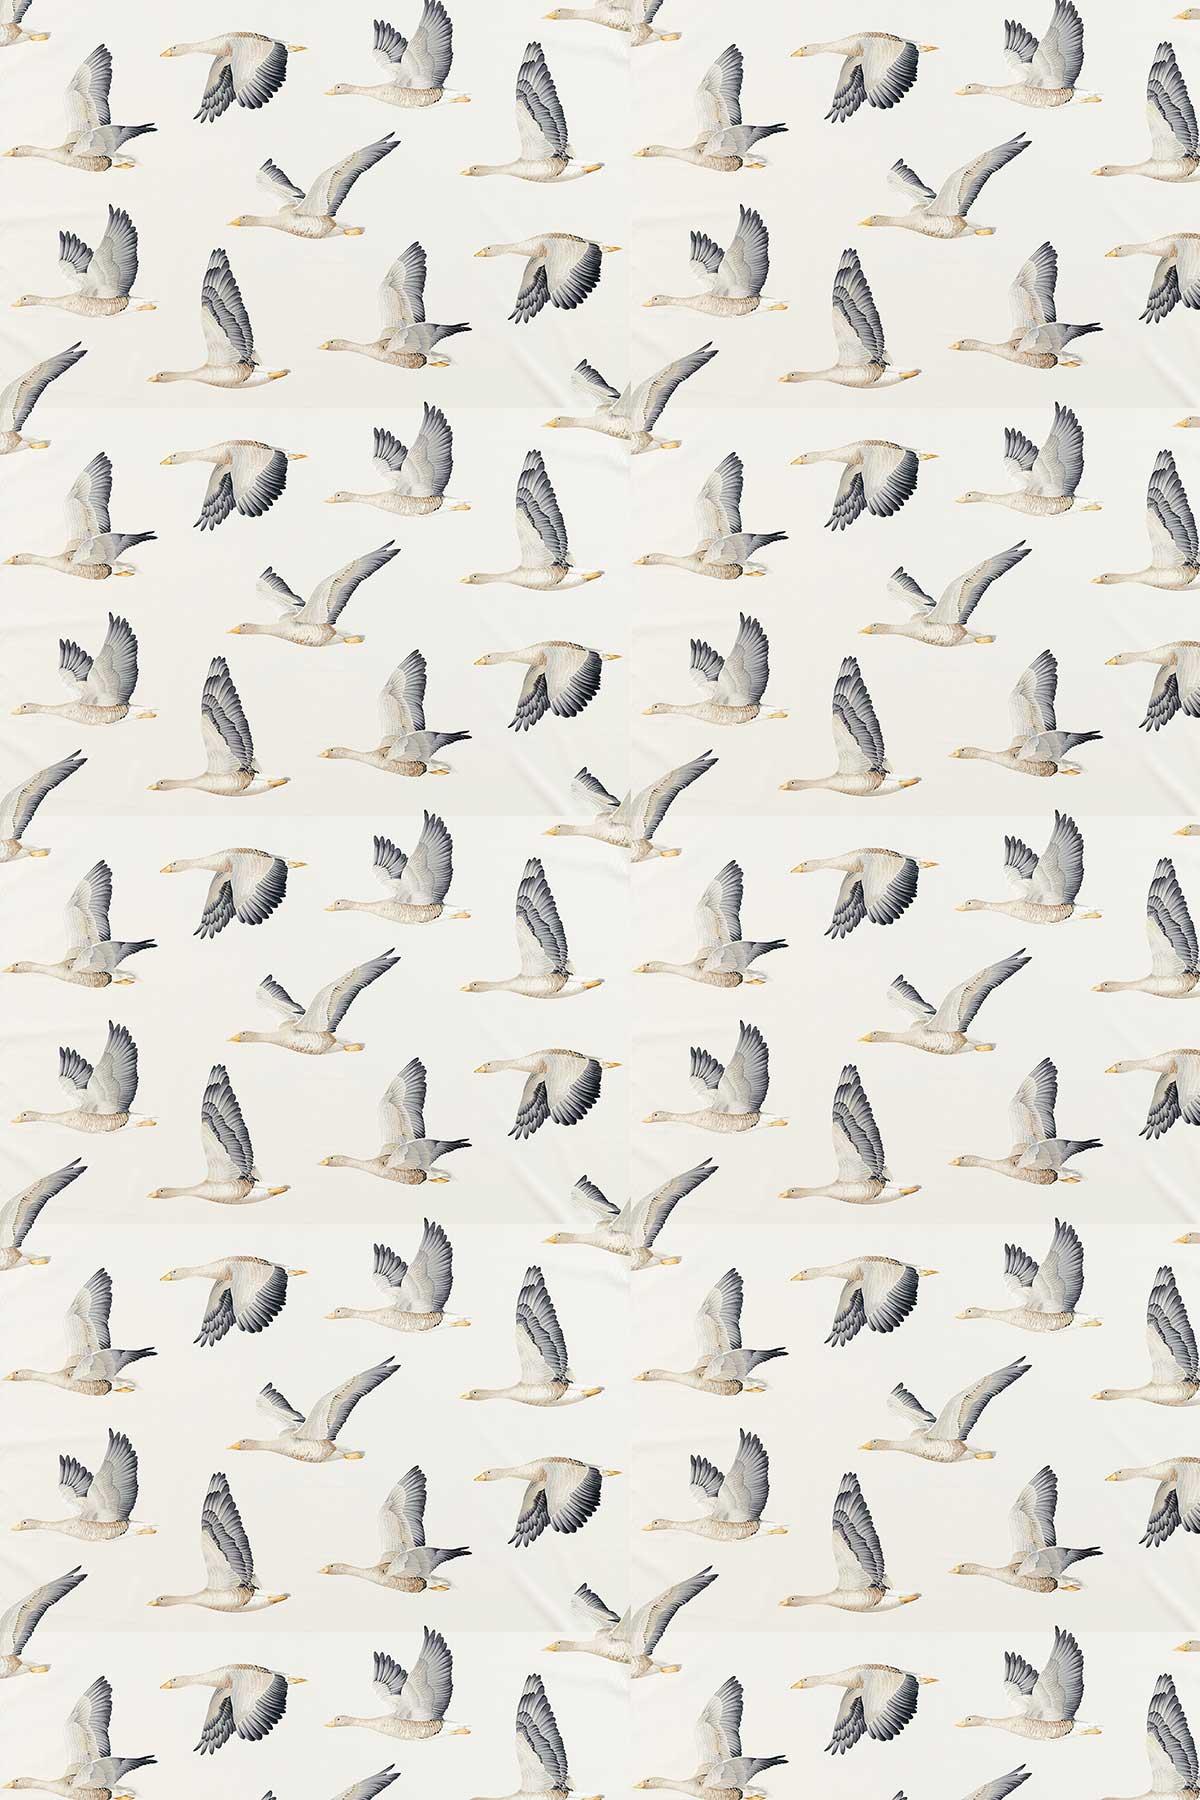 Elysian Geese Fabric - Silver / Chalk - by Sanderson